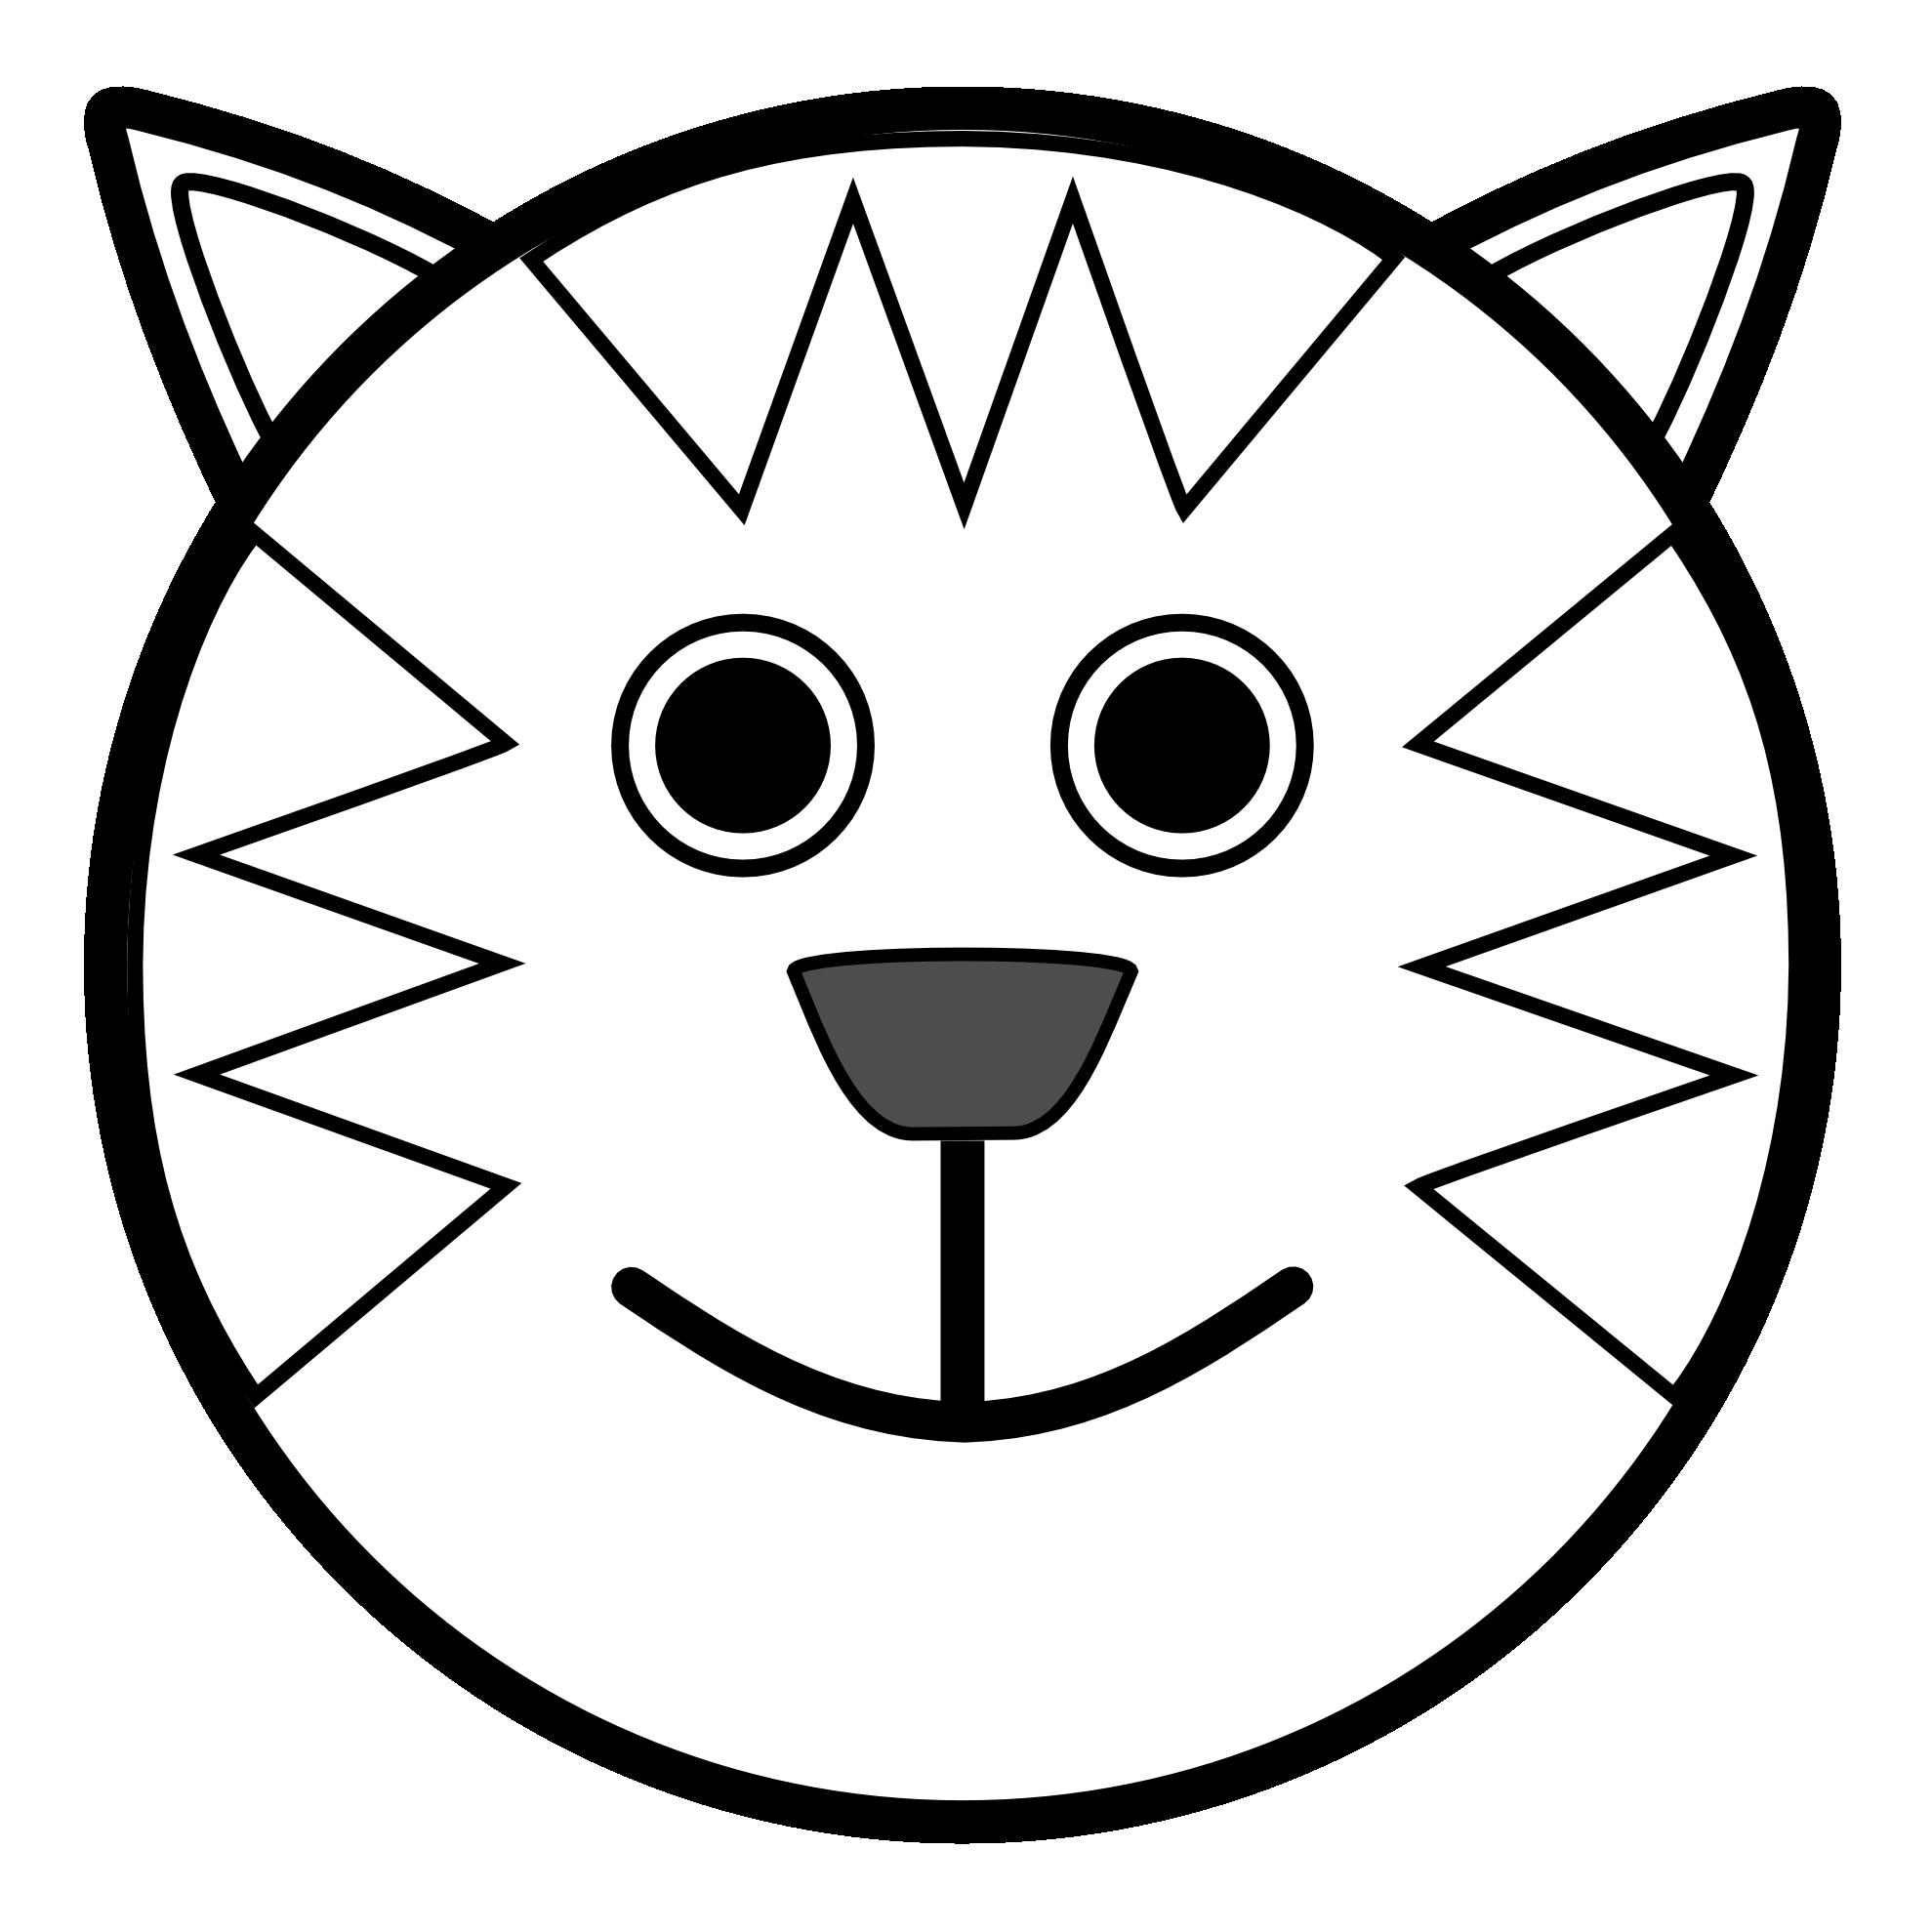 Free Line Art Animals, Download Free Clip Art, Free Clip Art.